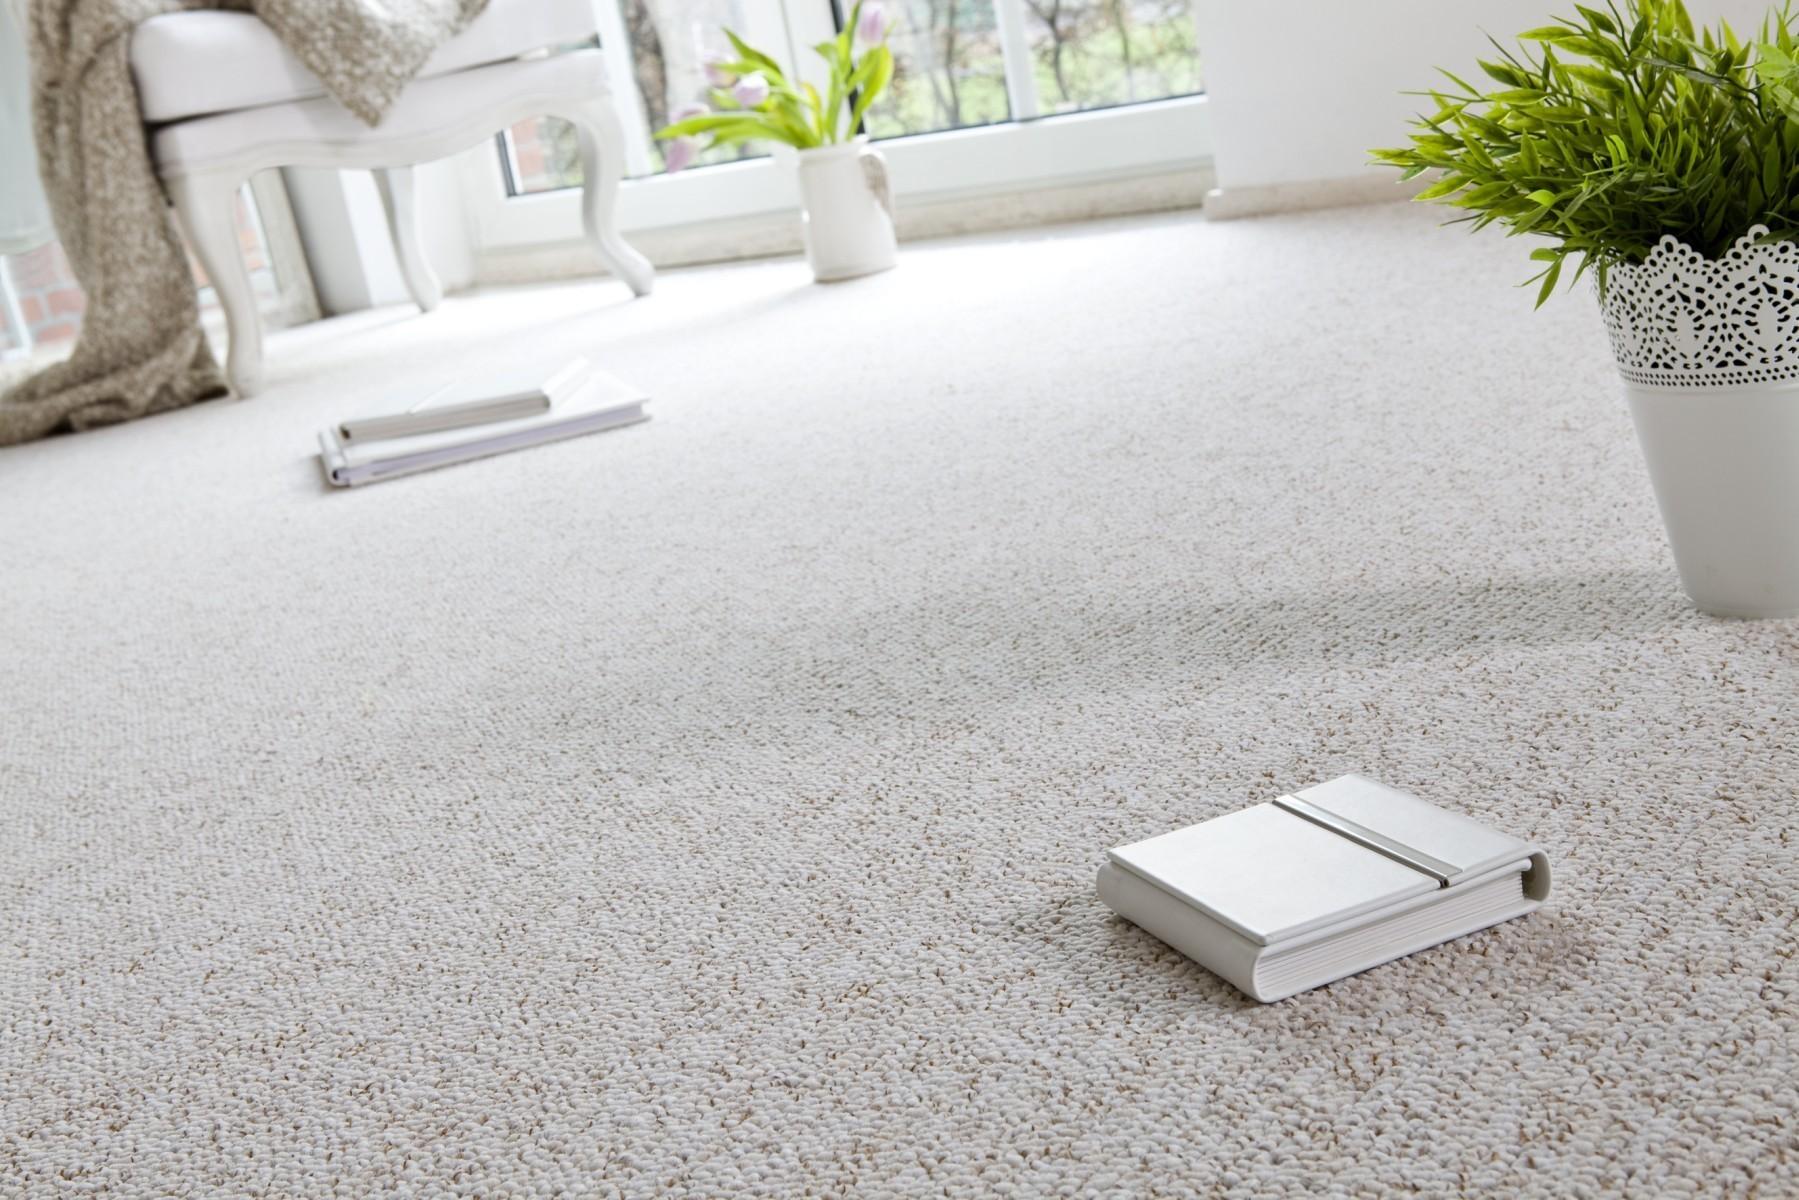 Teppichboden  Teppichboden › Reinkemeier Rietberg - Handel |Logistik |Ladenbau